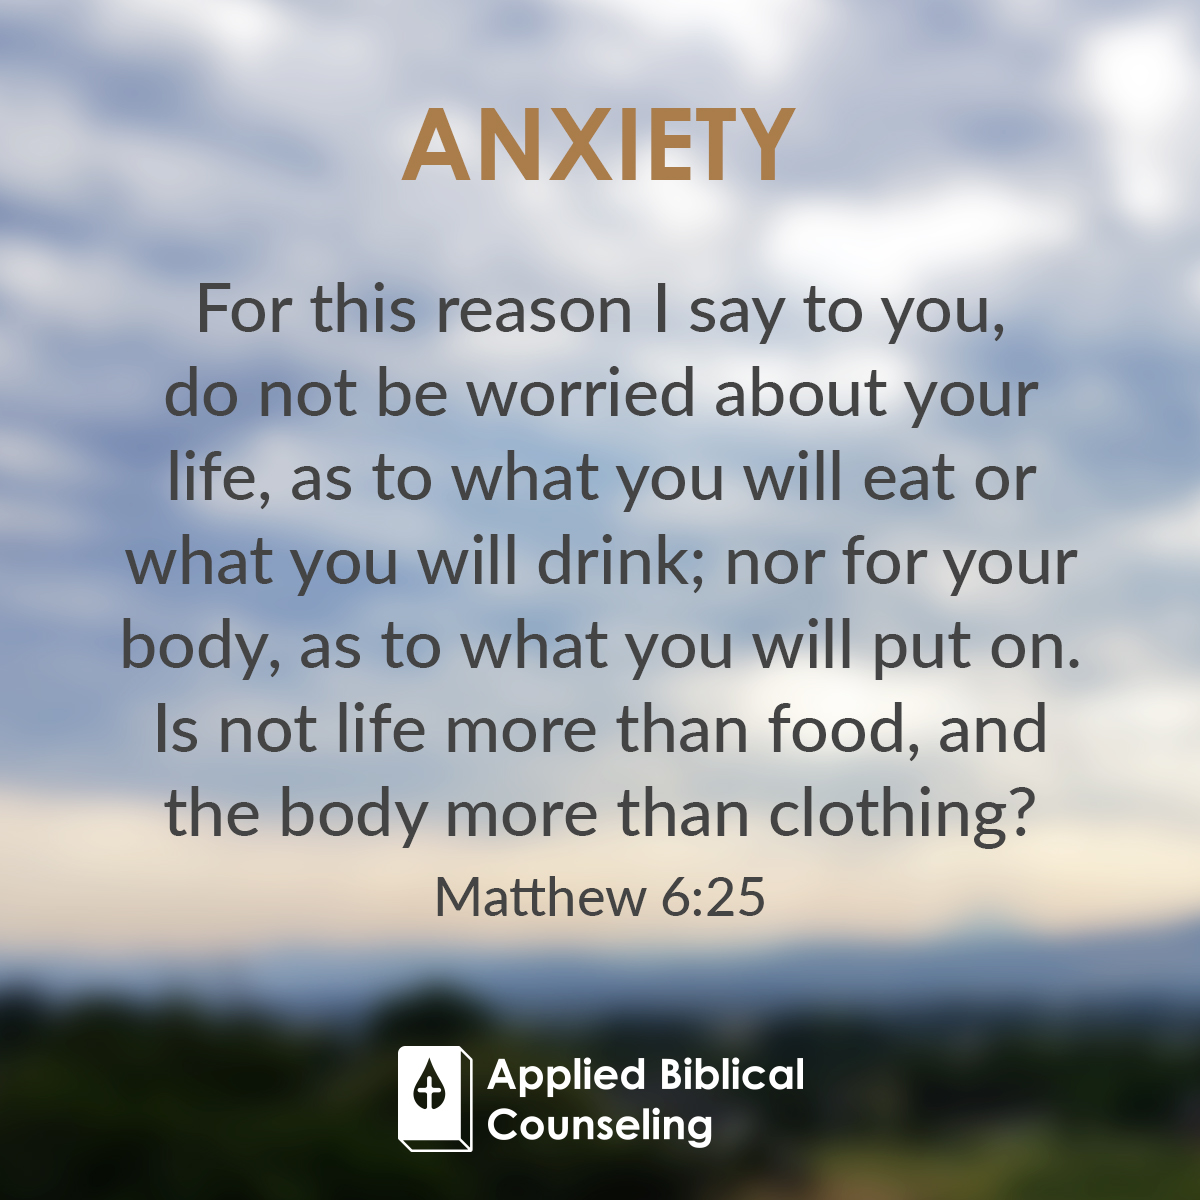 ABC_Facebook-w8-anxiety-4